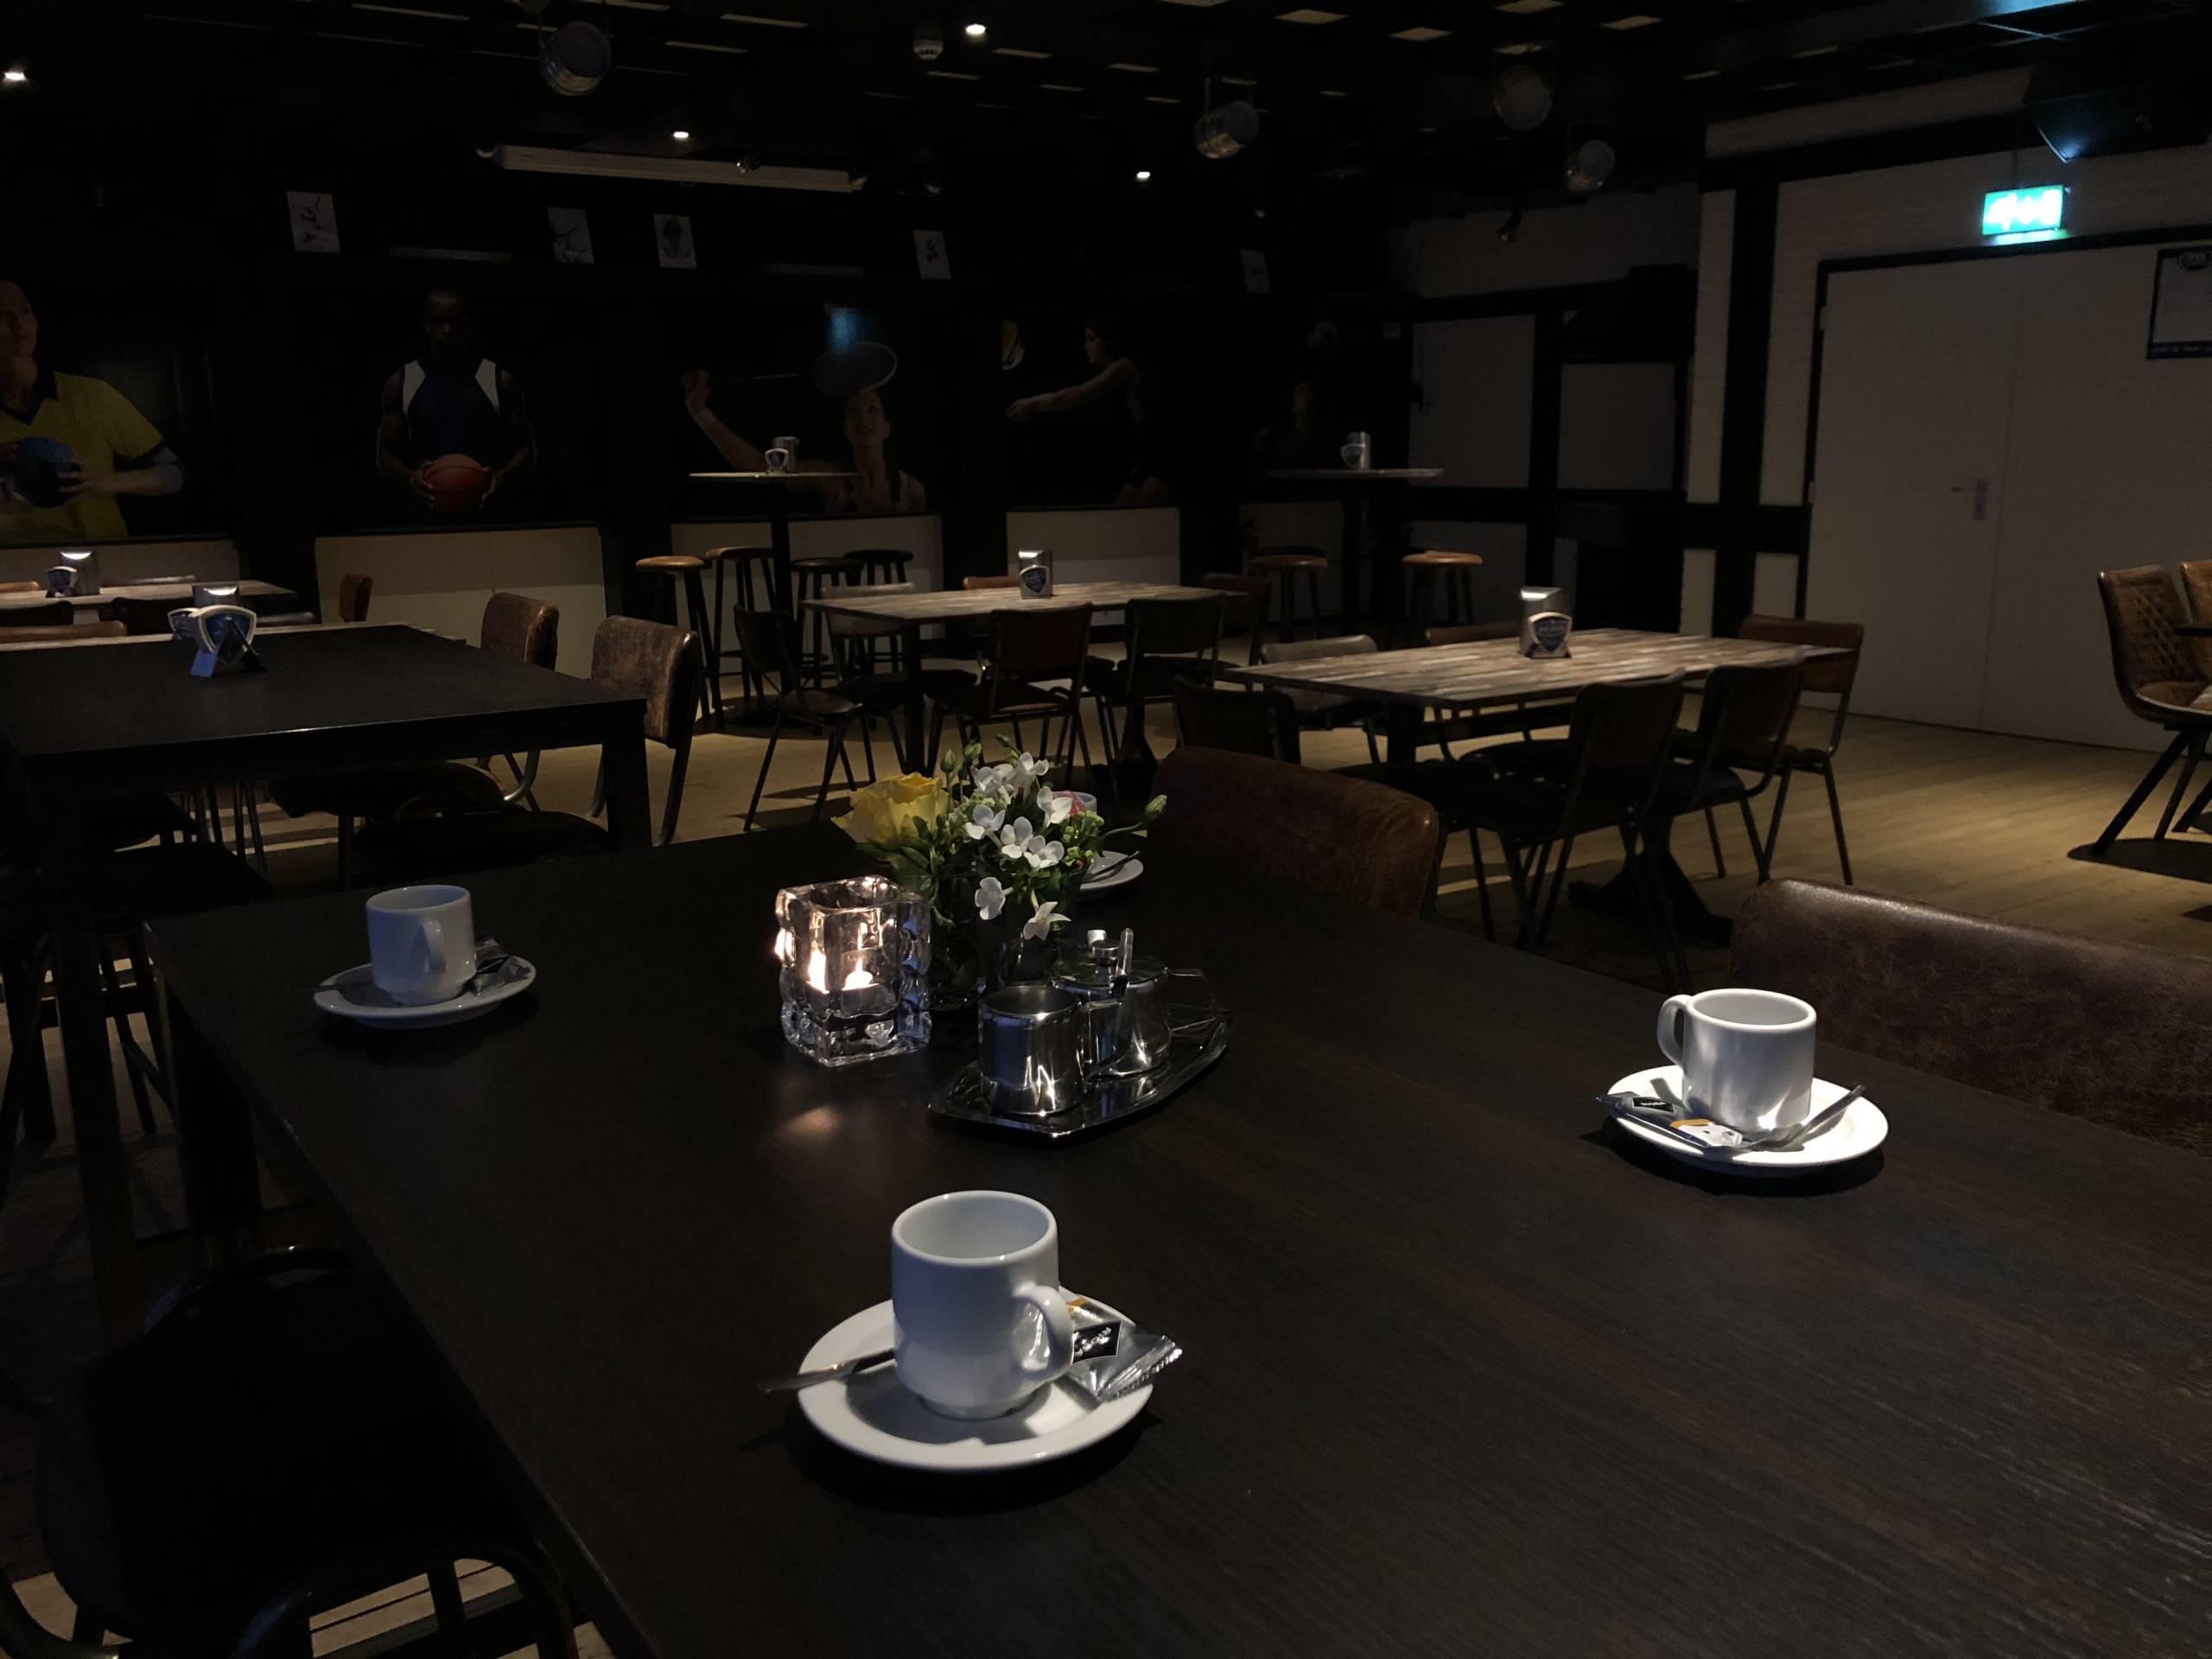 Koffietafel-grote-zaal-scaled